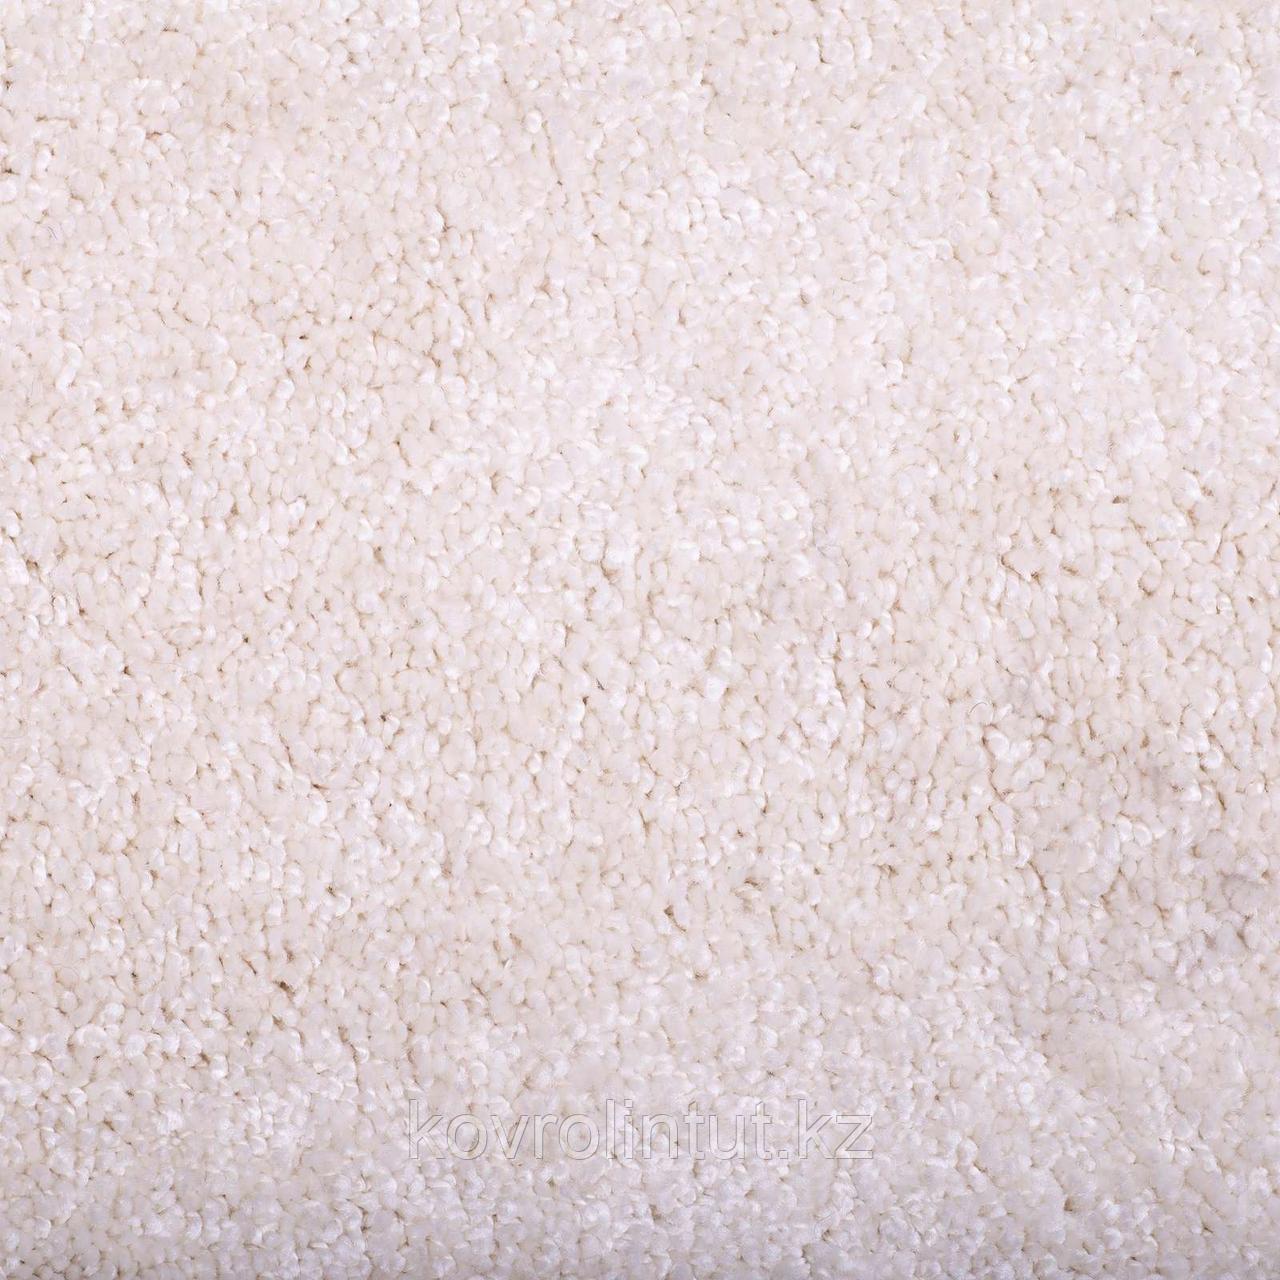 Покрытие ковровое Marshmellow 600, 4 м, 100% PP